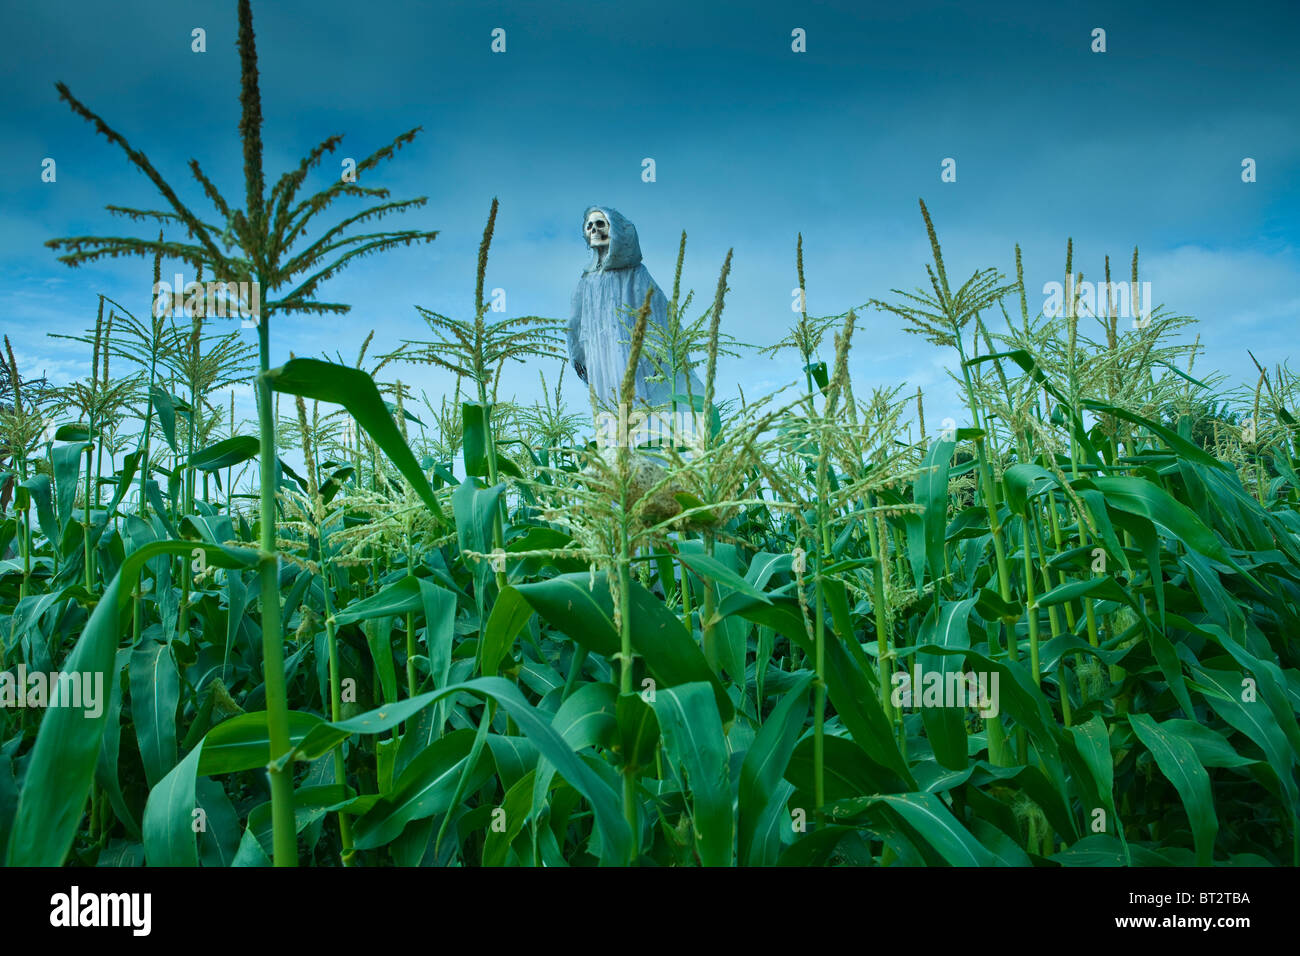 cornfield with skeleton scarecrow at Halloween, Santa Ynez Valley, California, United States of America - Stock Image